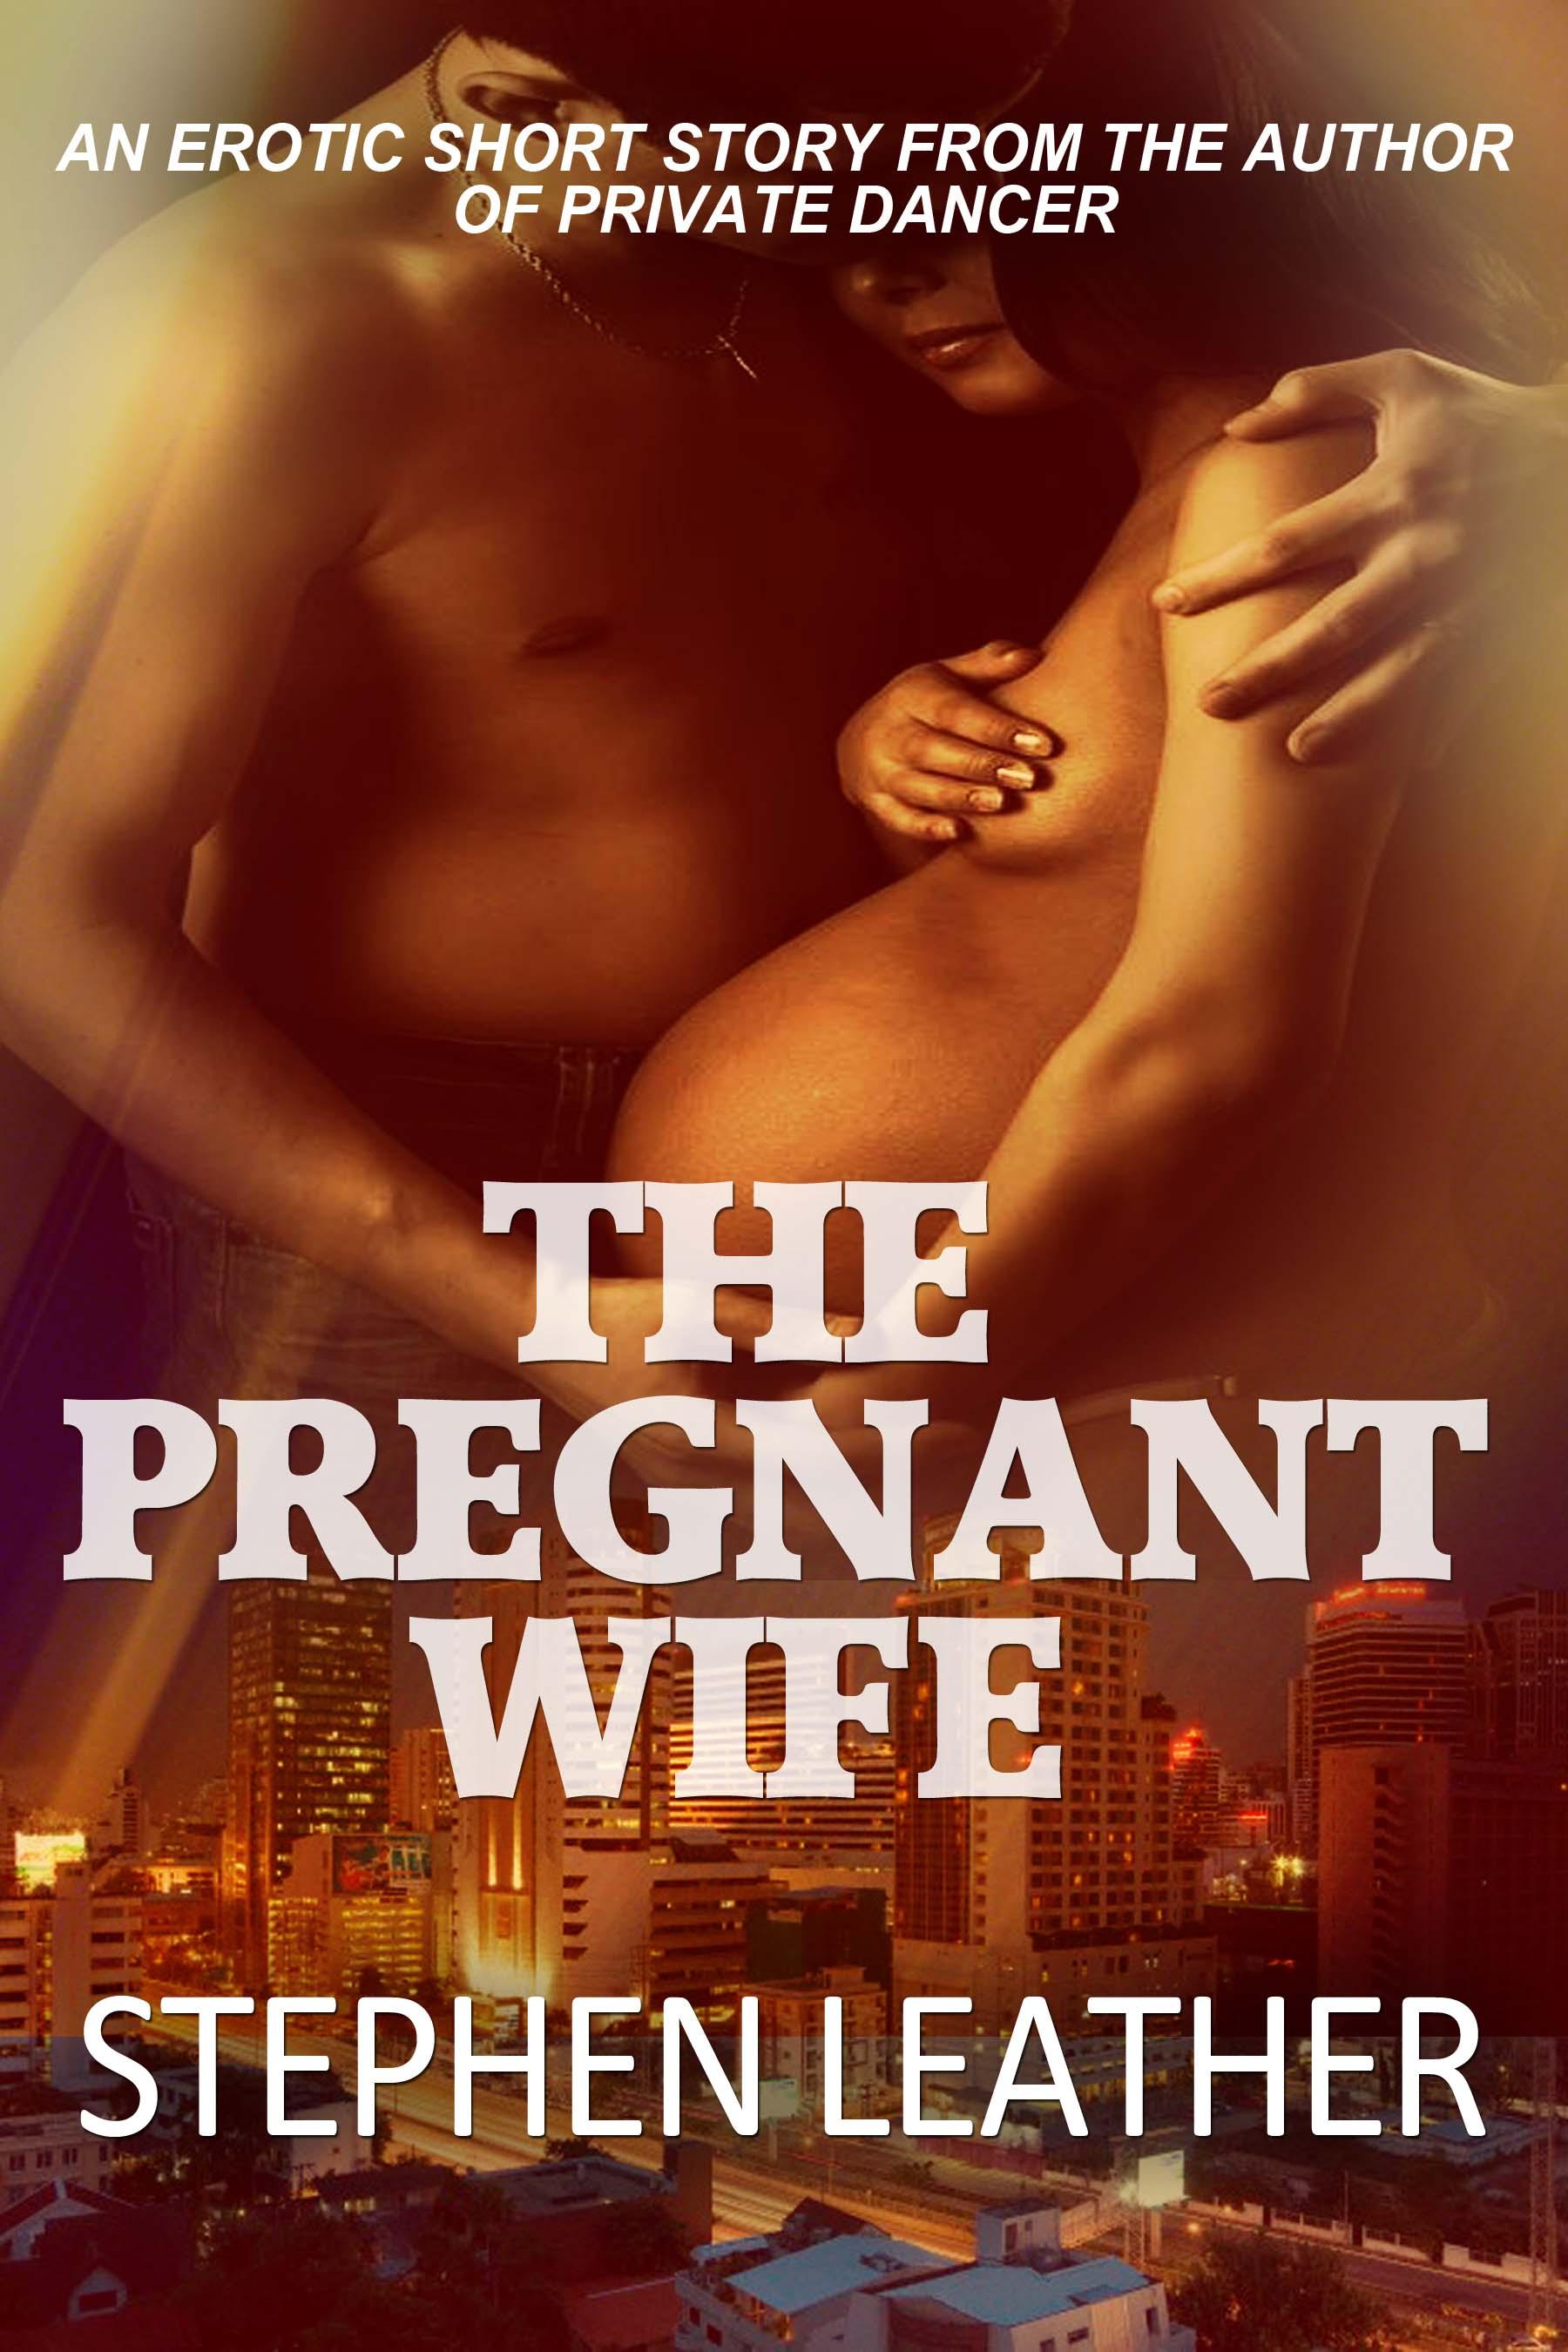 Pregnant Erotic Stories